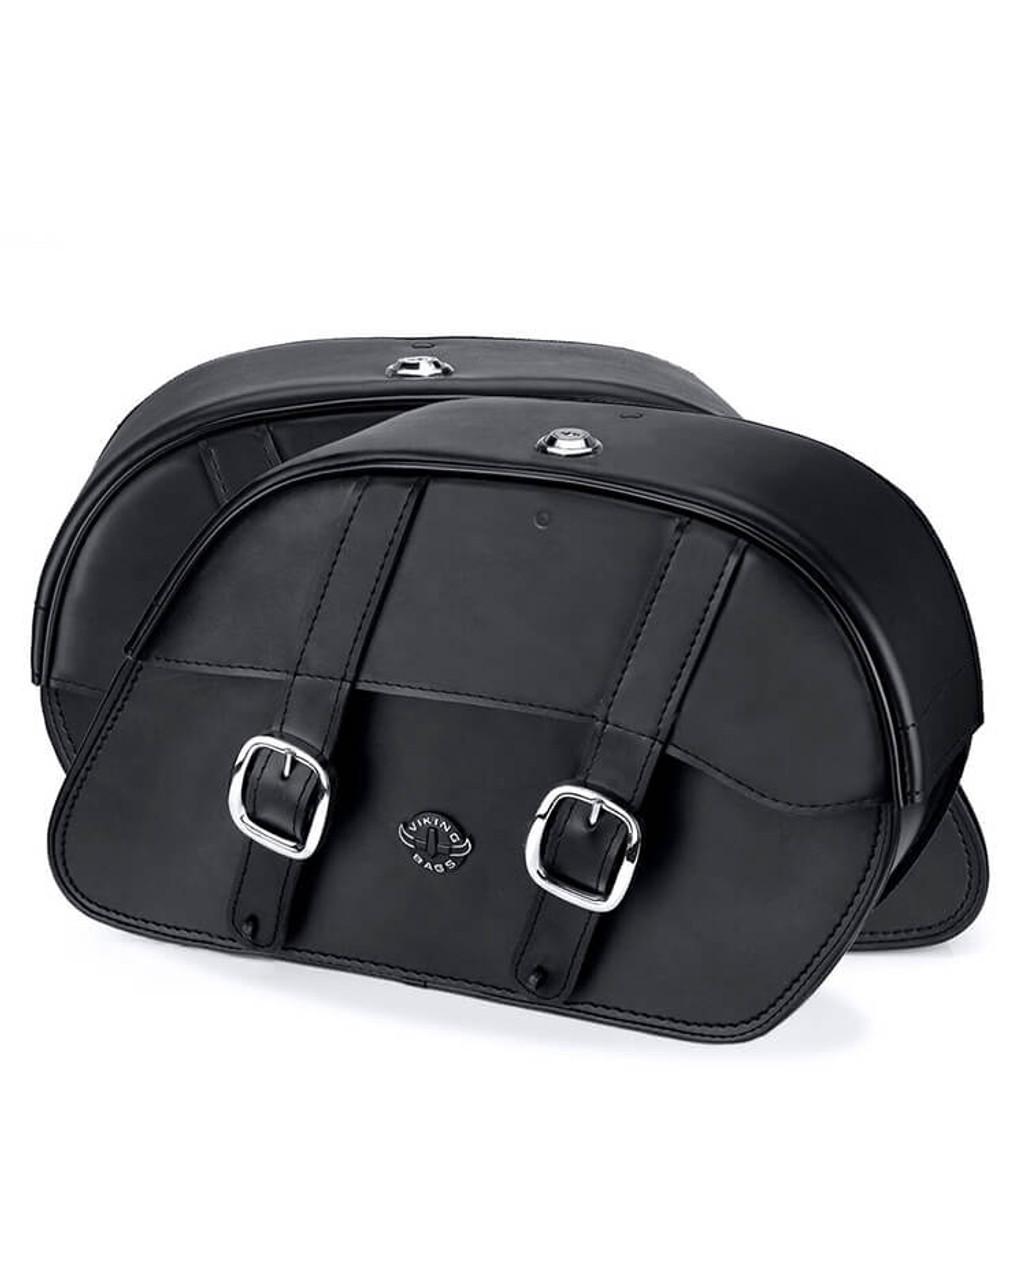 Victory Vegas Medium Slanted Motorcycle Saddlebags Both Bags View